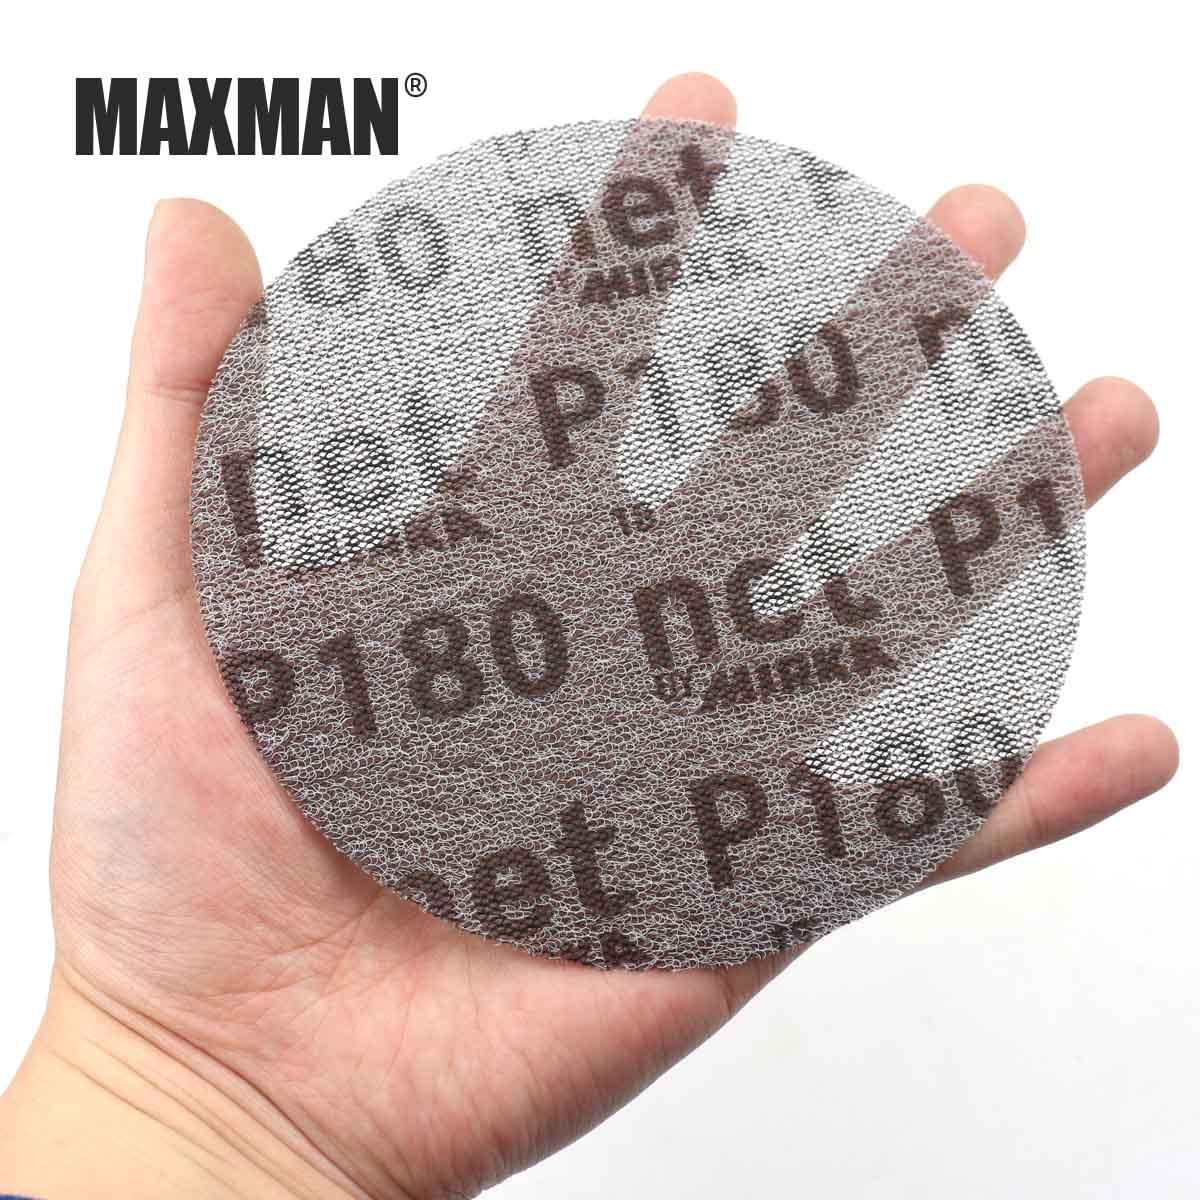 60-10000 Grit Round Abrasive Sandpaper 4-6 Inch Hook /& Loop Wet And Dry Grinding